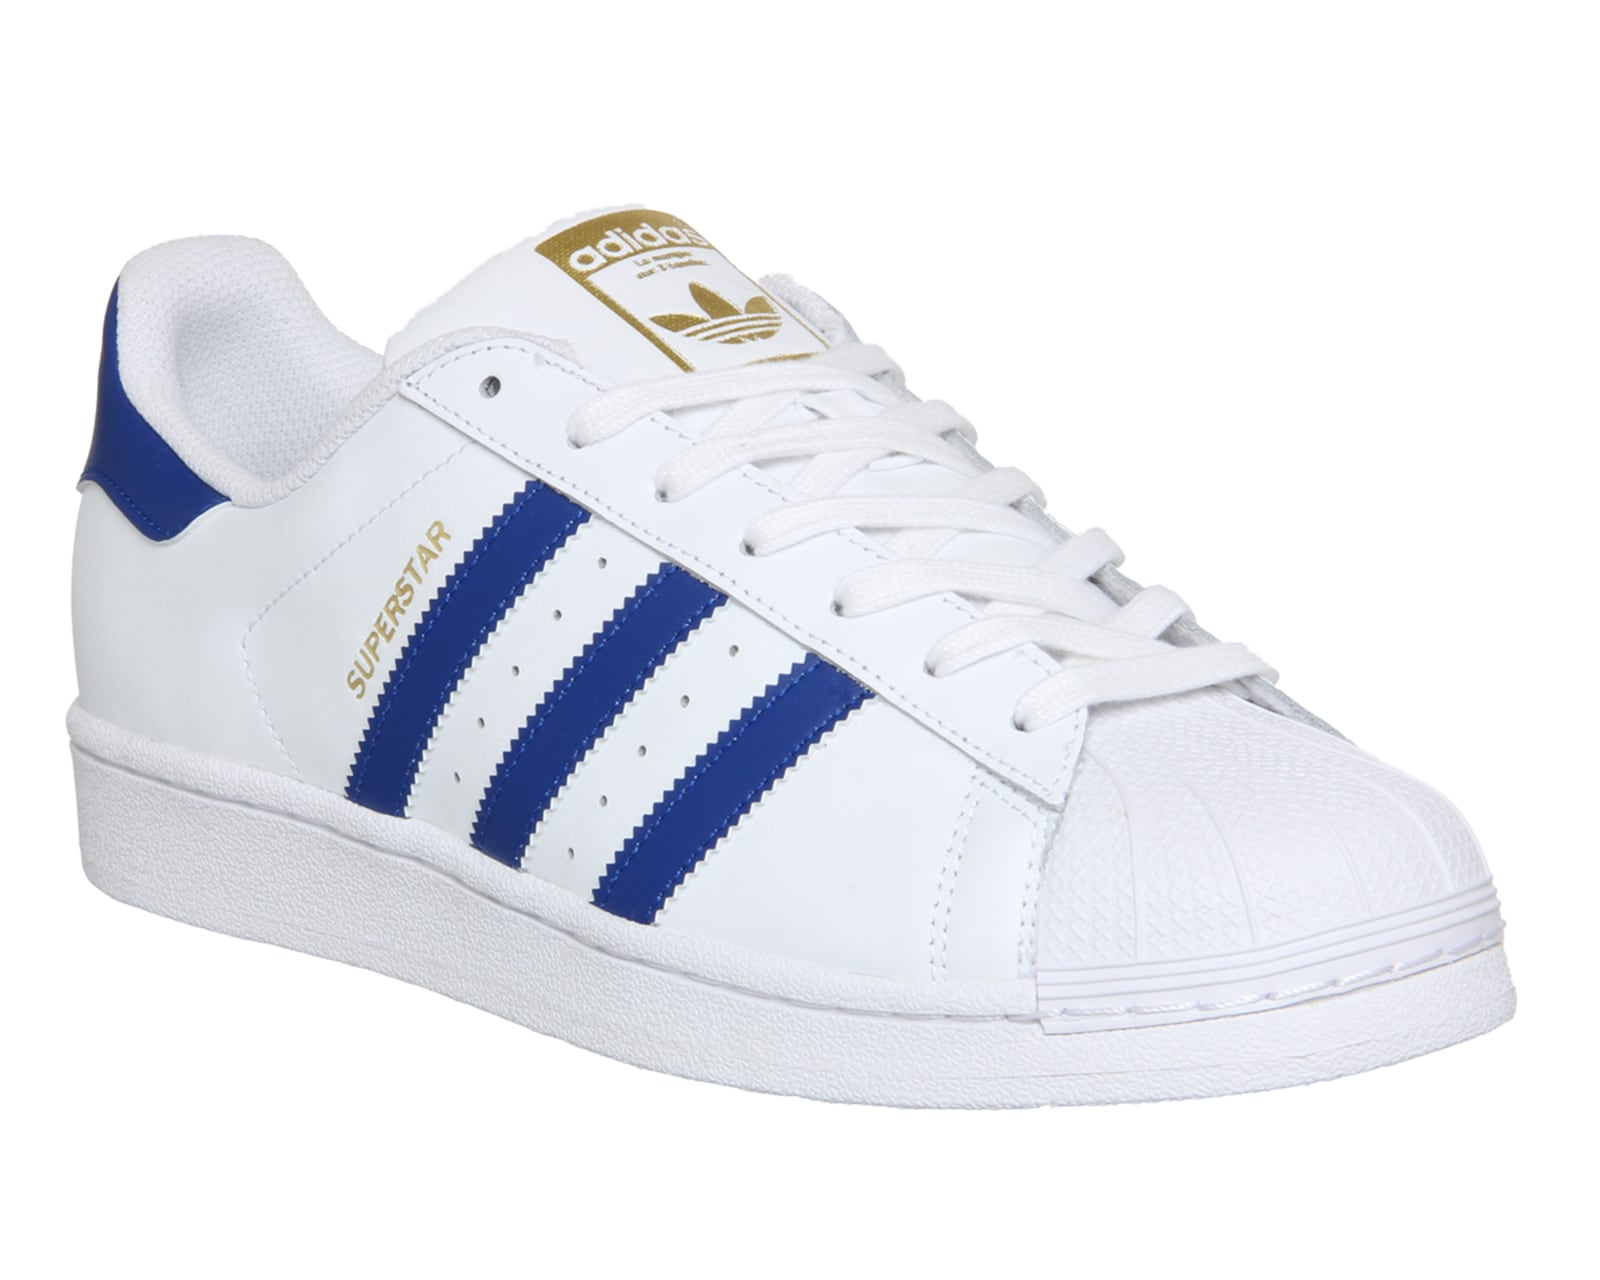 Adidas Sneakers Superstar 1 White Collegiate Royal